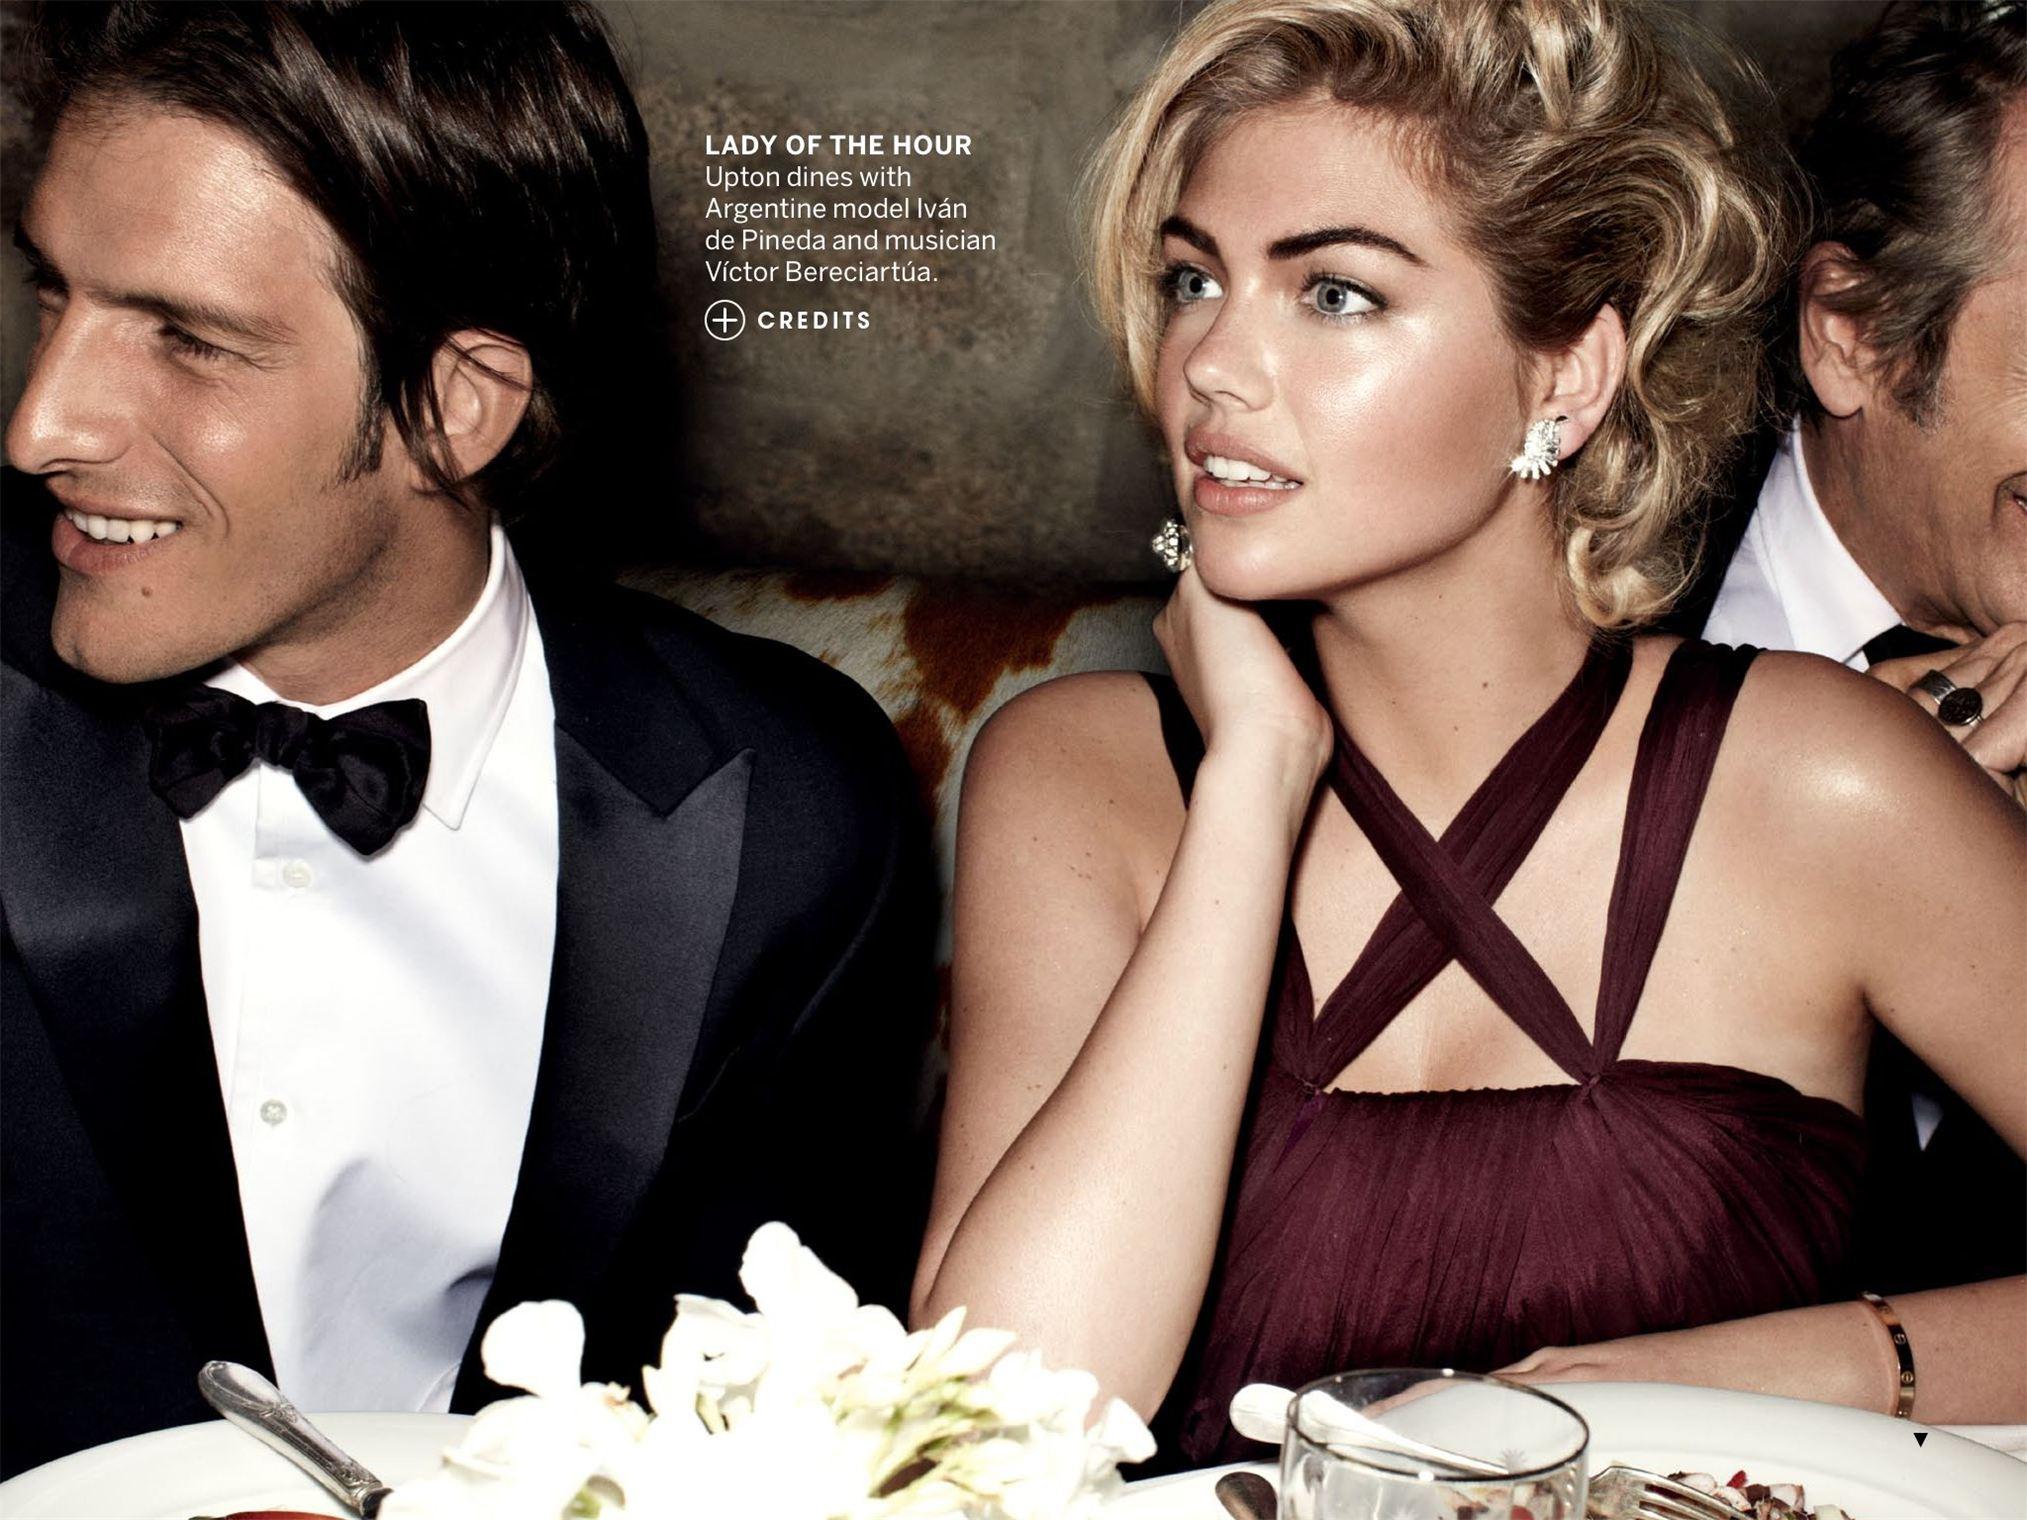 Kate Upton / Кейт Аптон - самая горячая супермодель мира в журнале Vogue US, июнь 2013 / фотограф Mario Testino